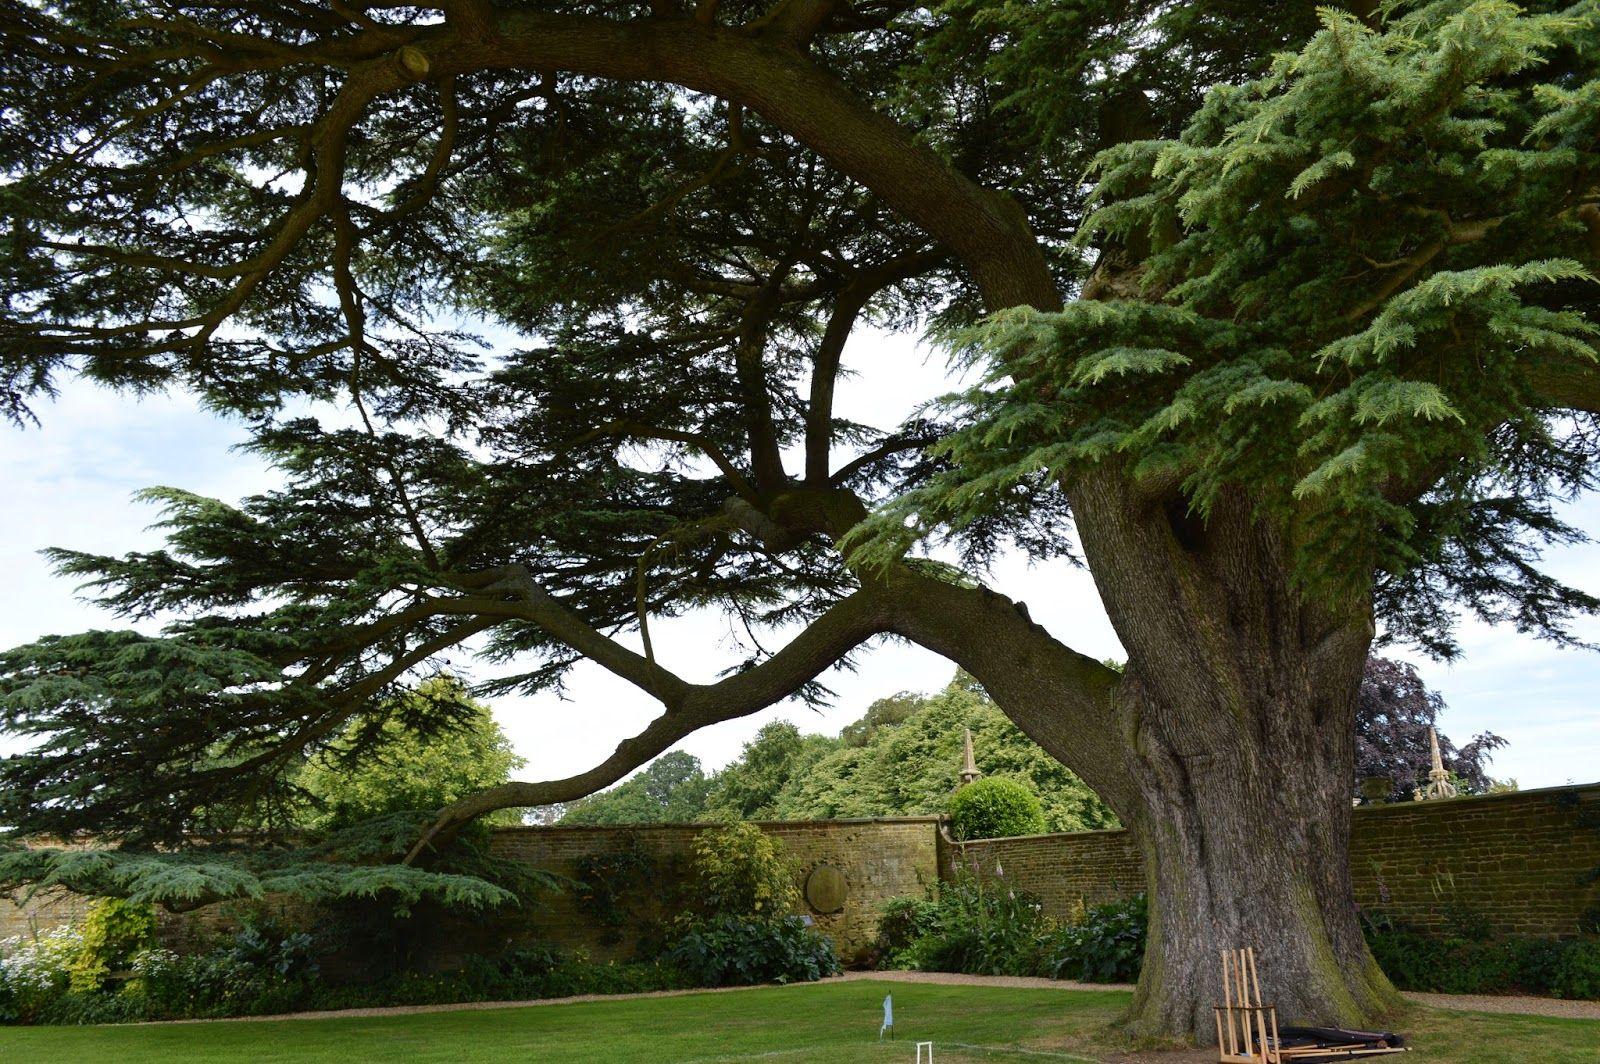 cedar tree and croquet lawn